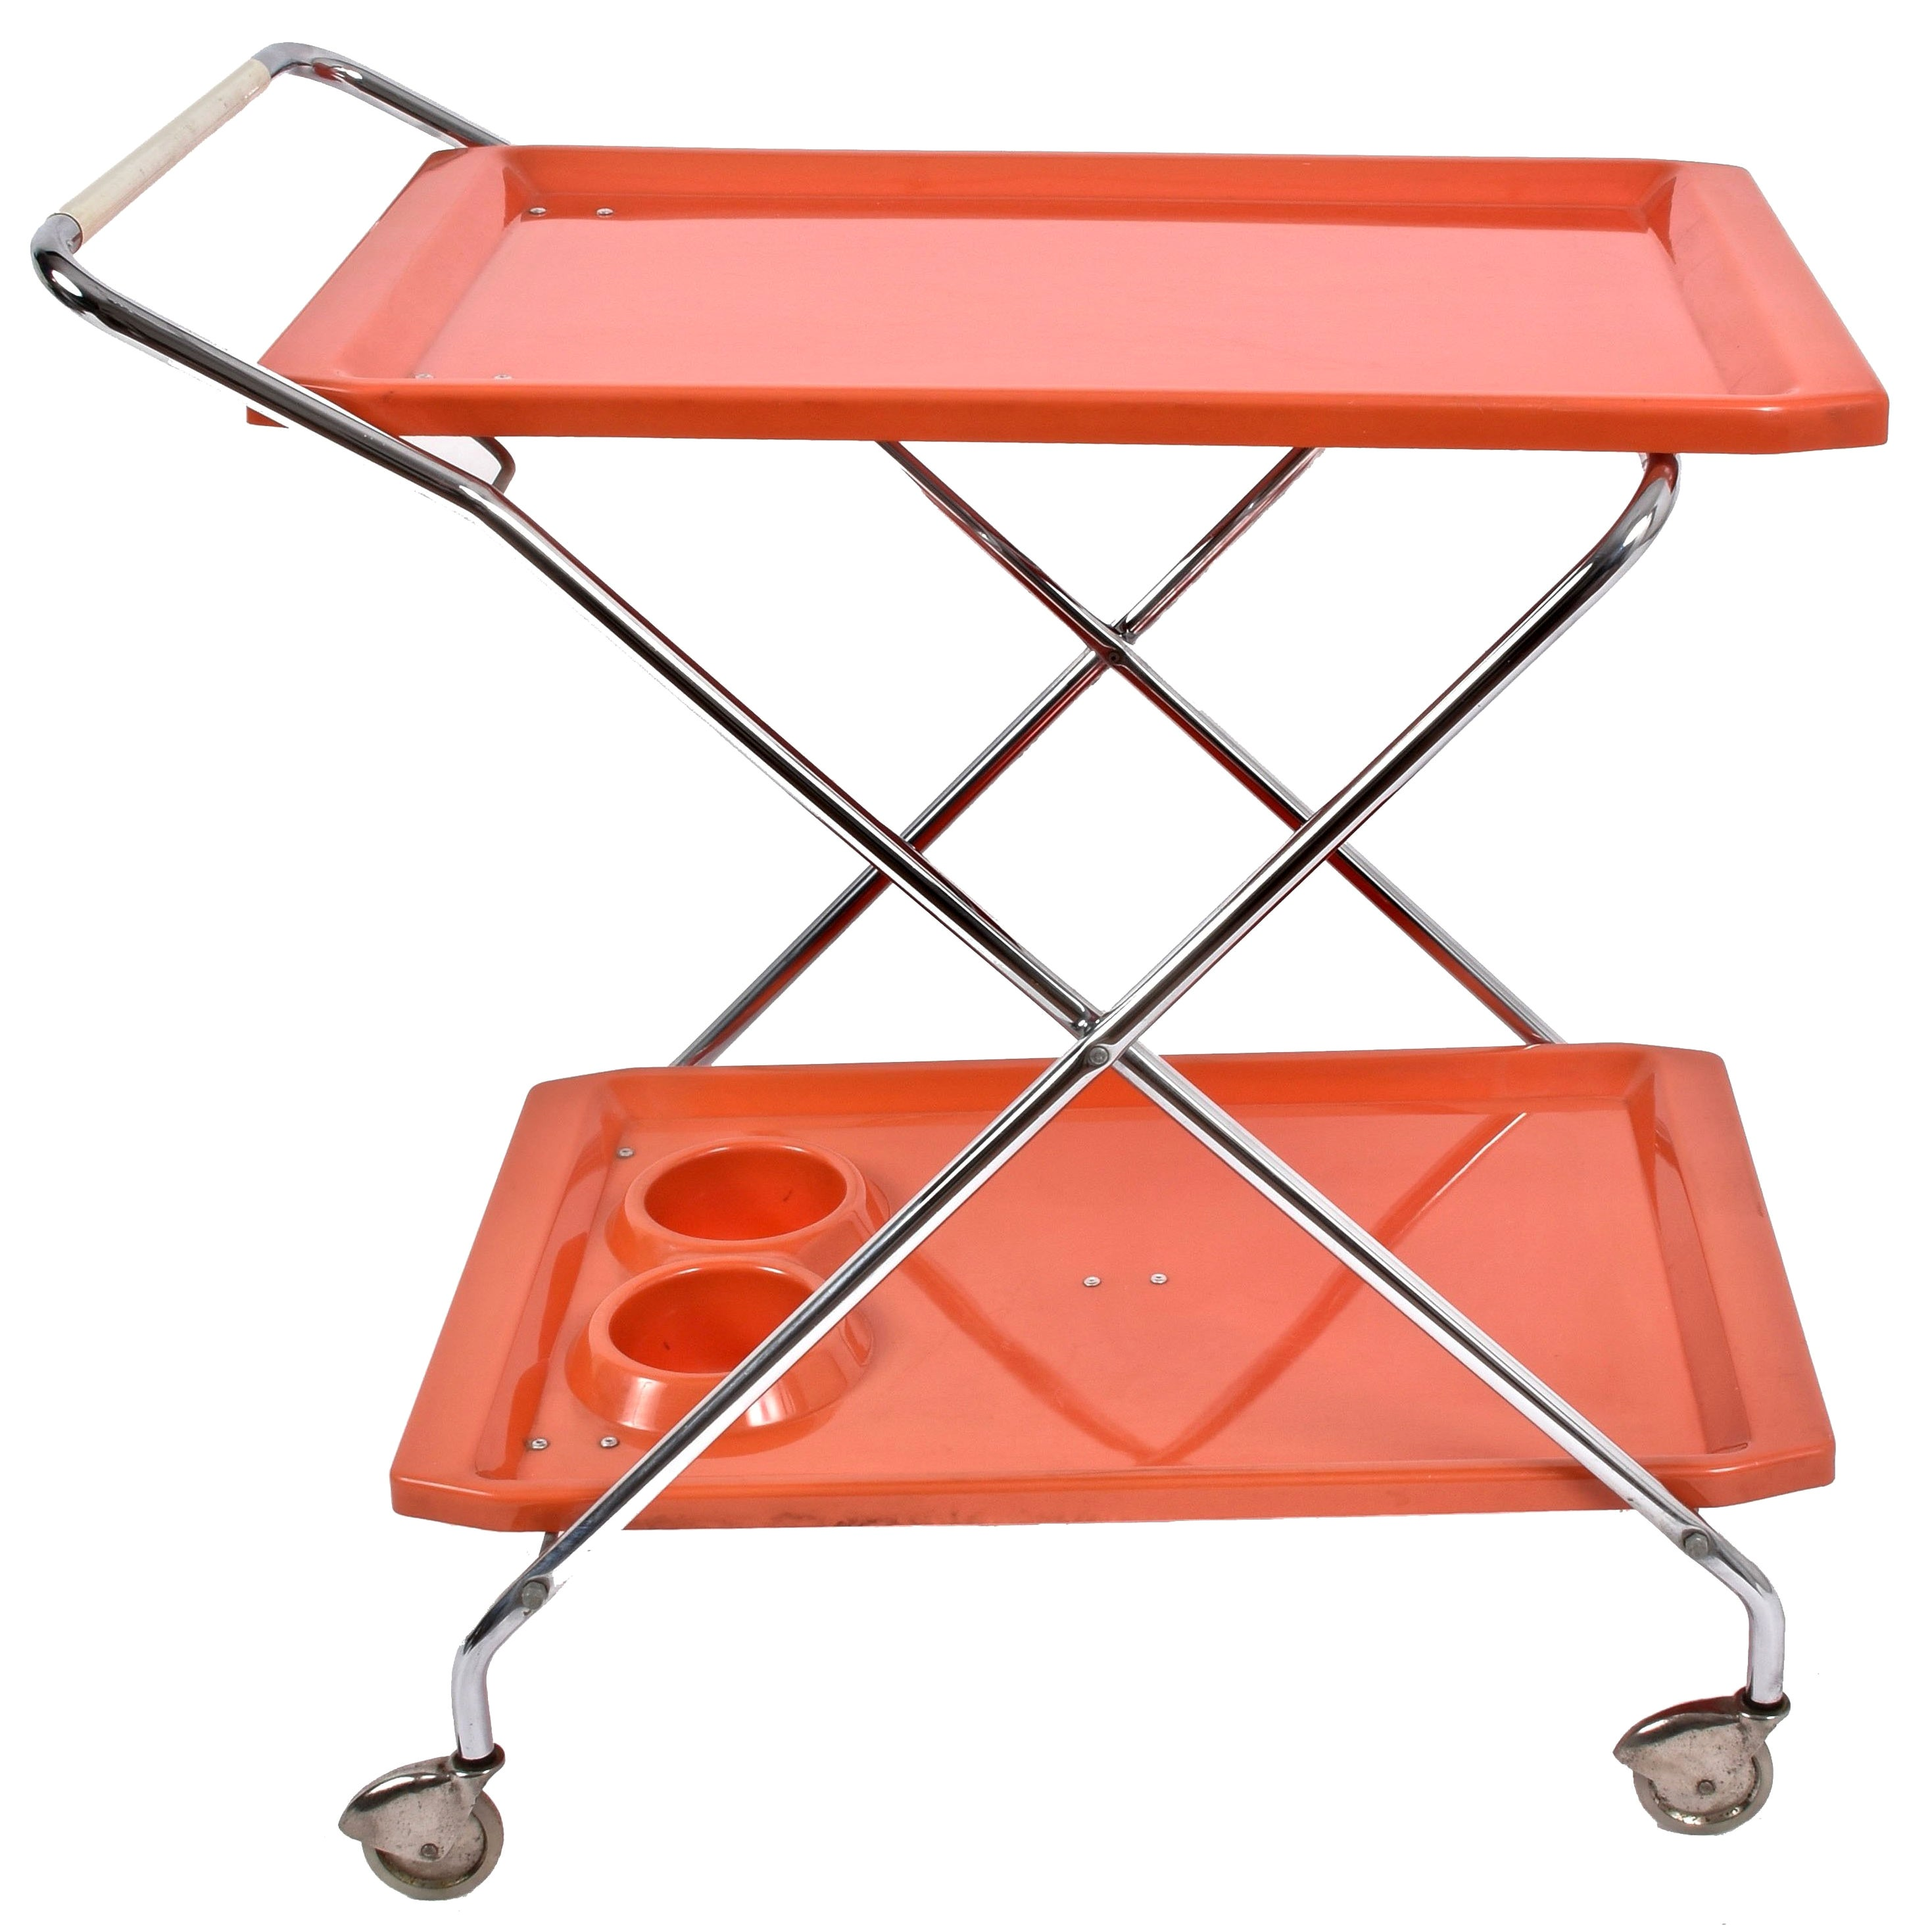 Midcentury Orange Plastic and Chromed Metal Italian Foldable Bar Cart, 1950s